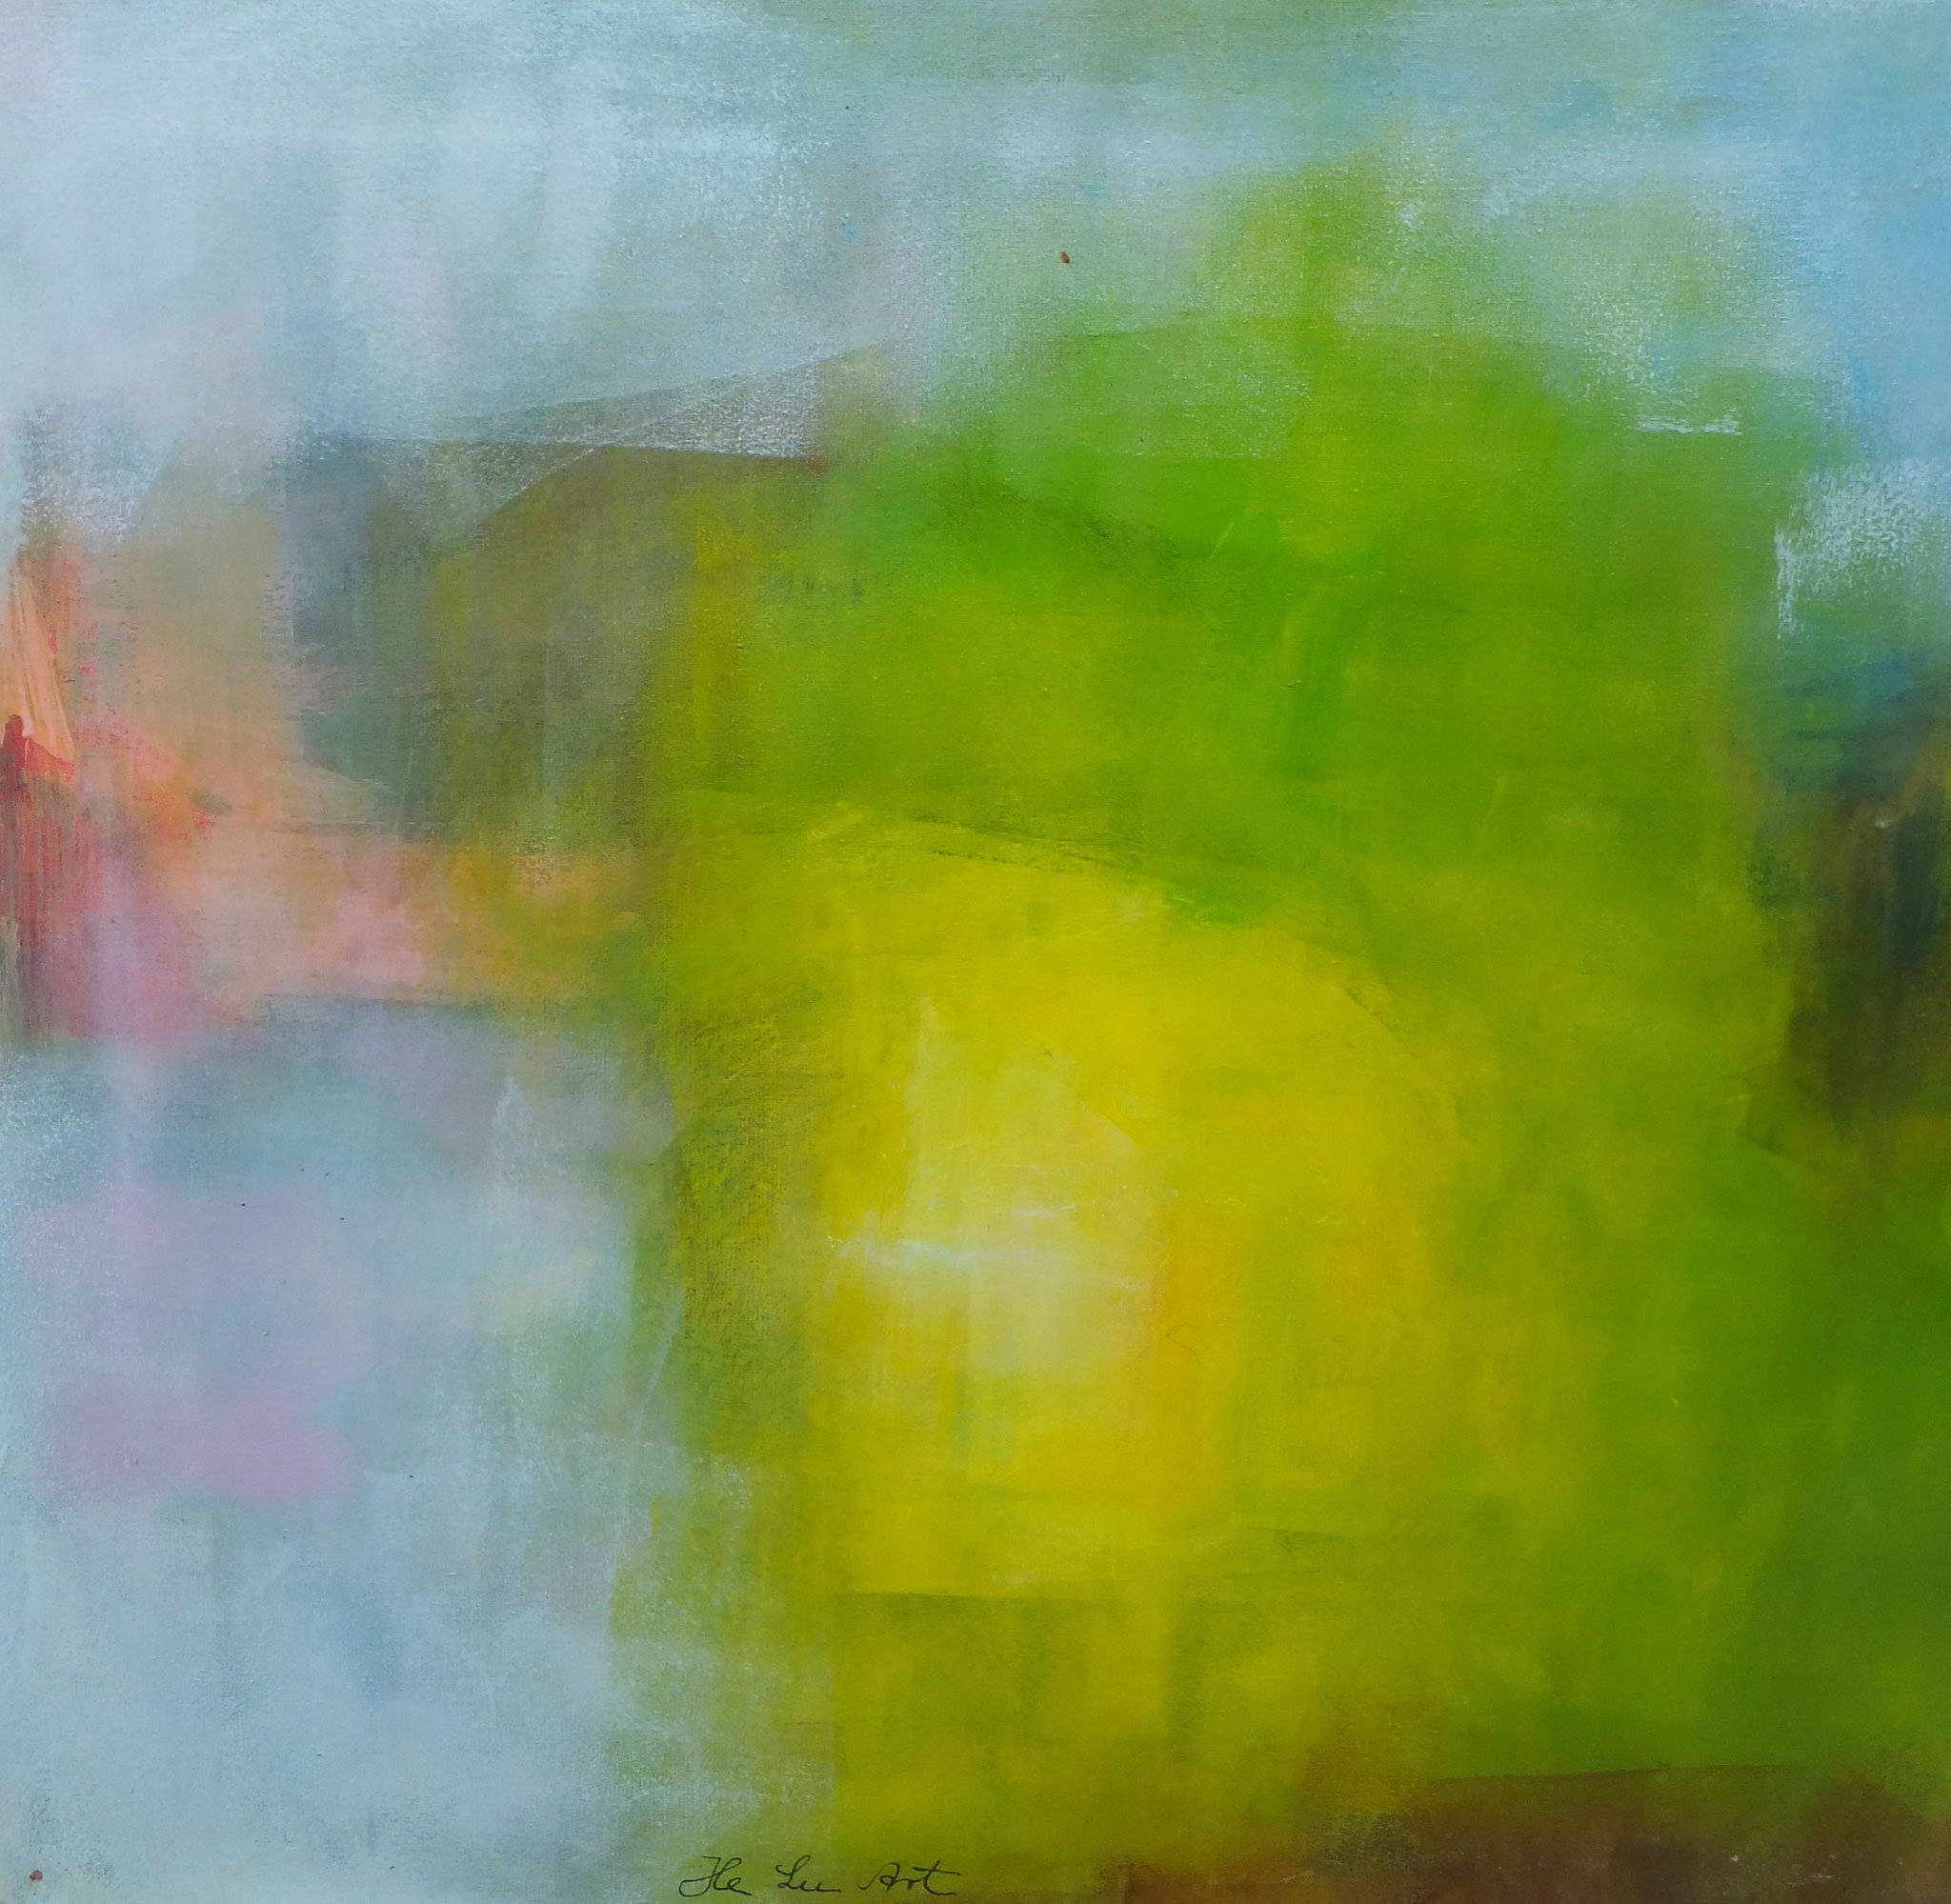 Bildtitel: Frühlingsgefühle - Frühling 40 x 40 cm  Acryl auf Leinwand (Vier Jahreszeiten insges. 4 Bilder)